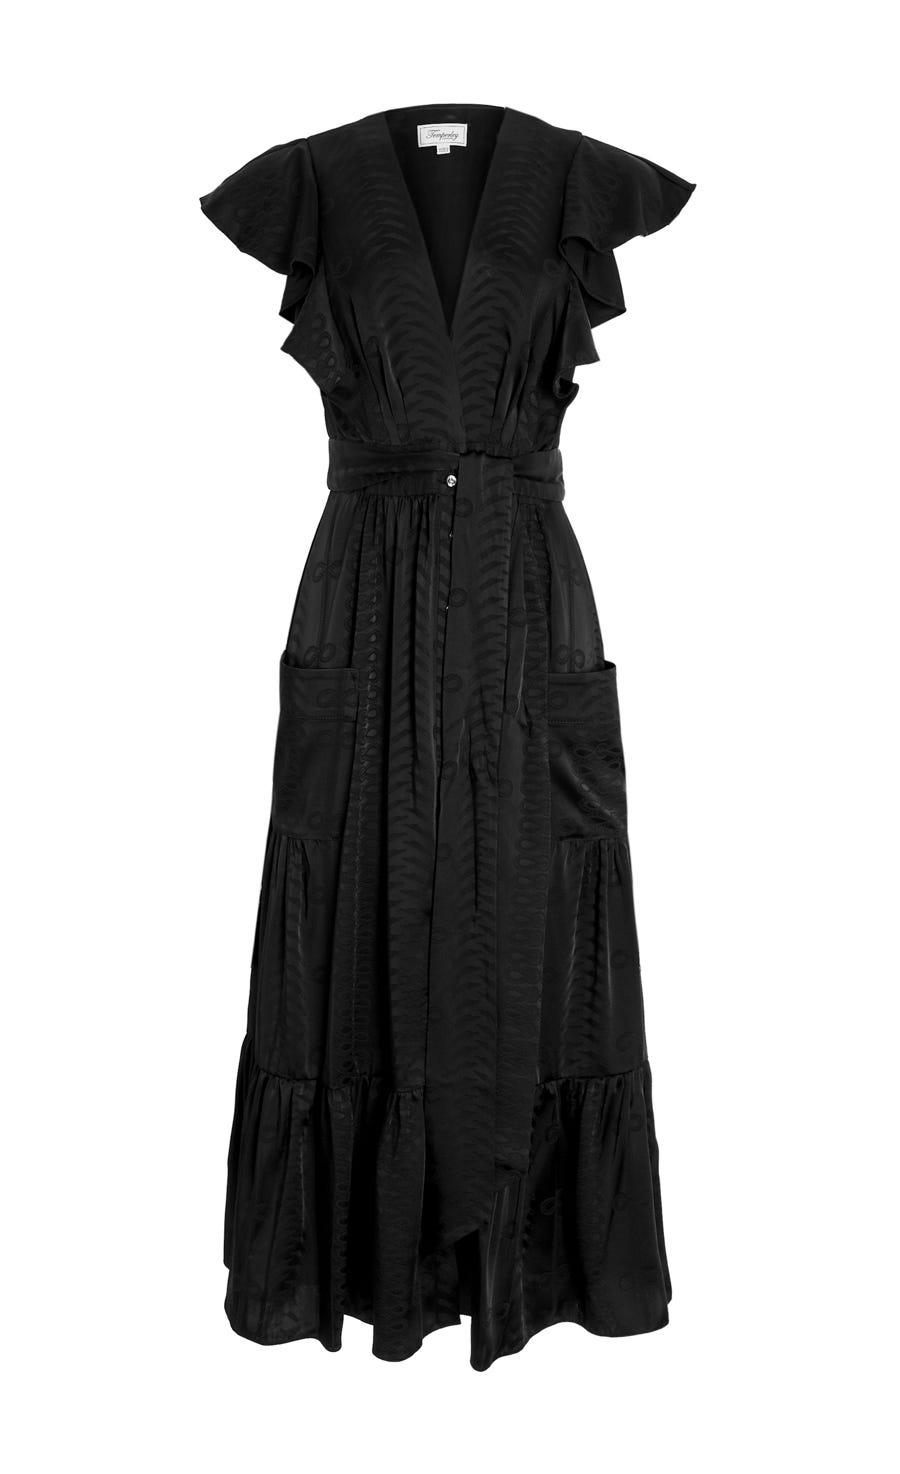 Erika V-Neck Dress